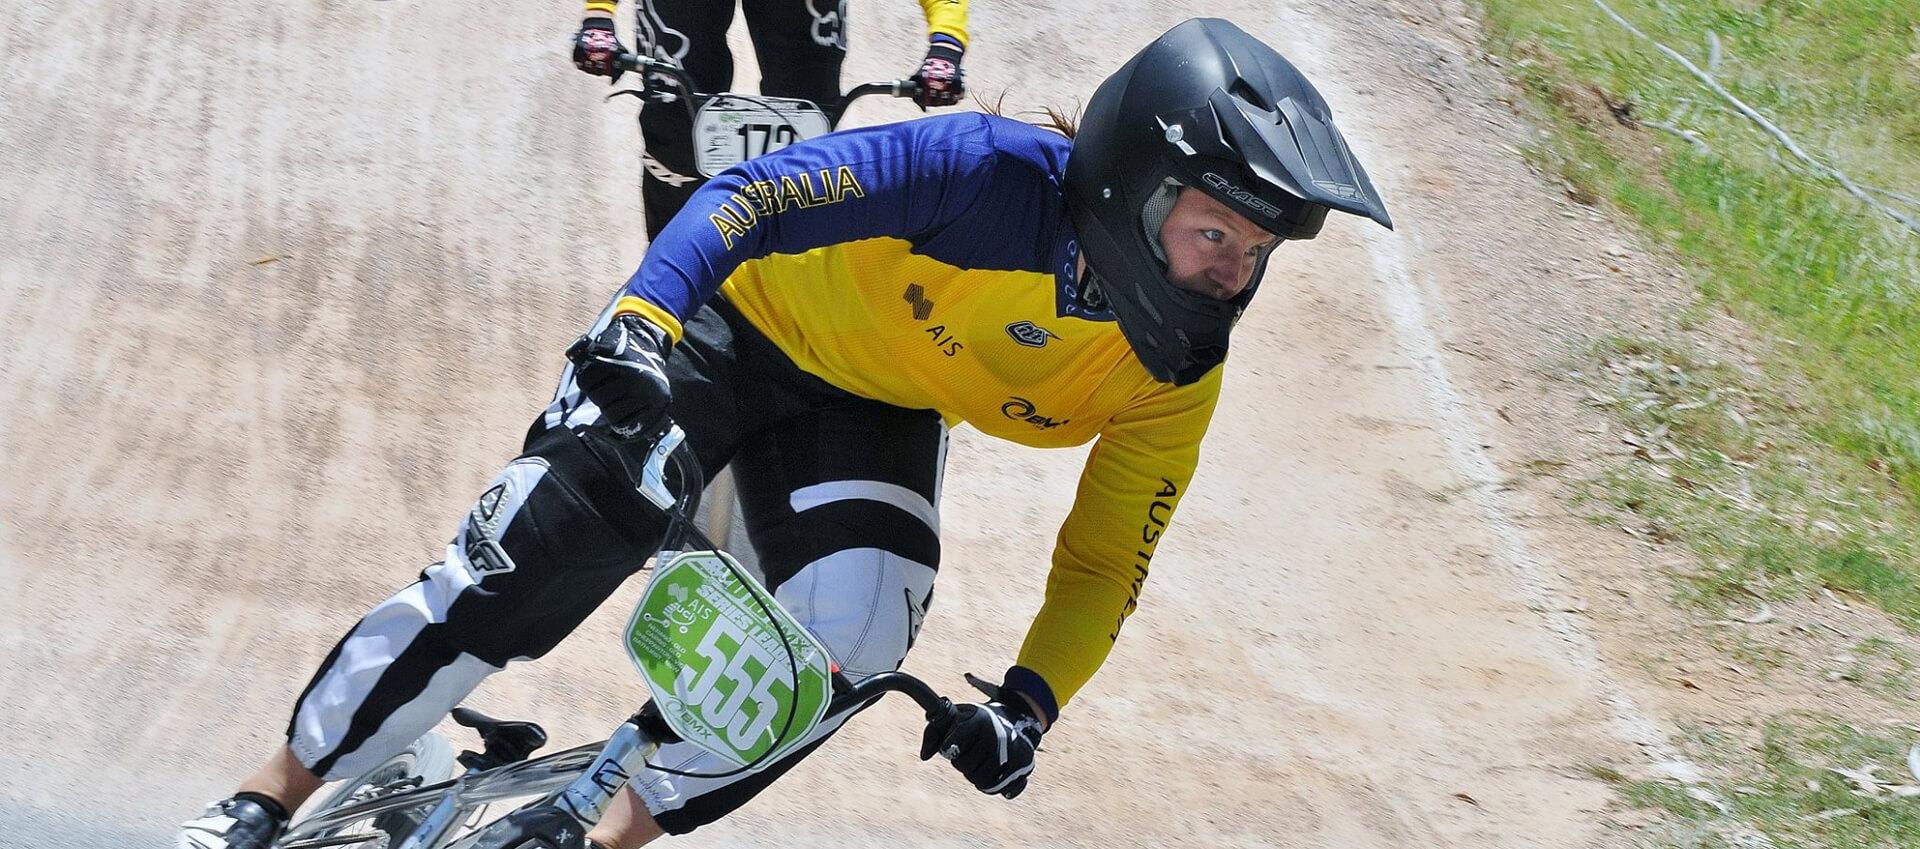 Melinda McLeod - Racer Pics & Sports Media